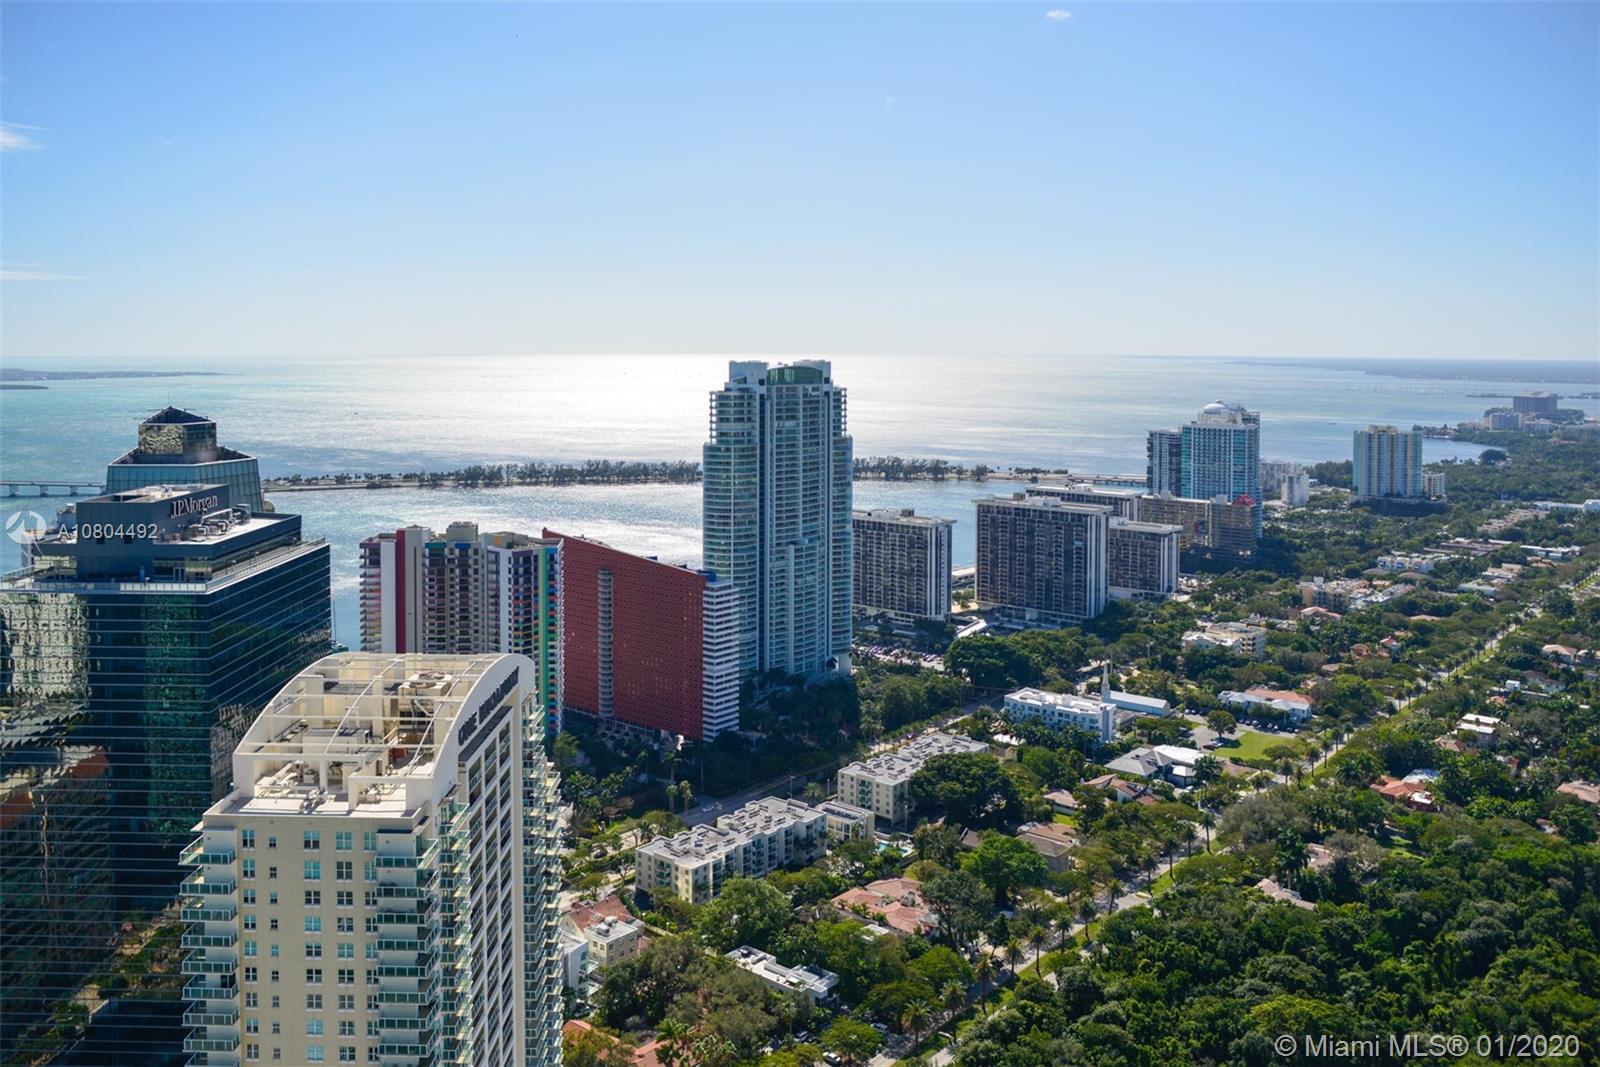 1300 S Miami Ave, PH5206 - Miami, Florida